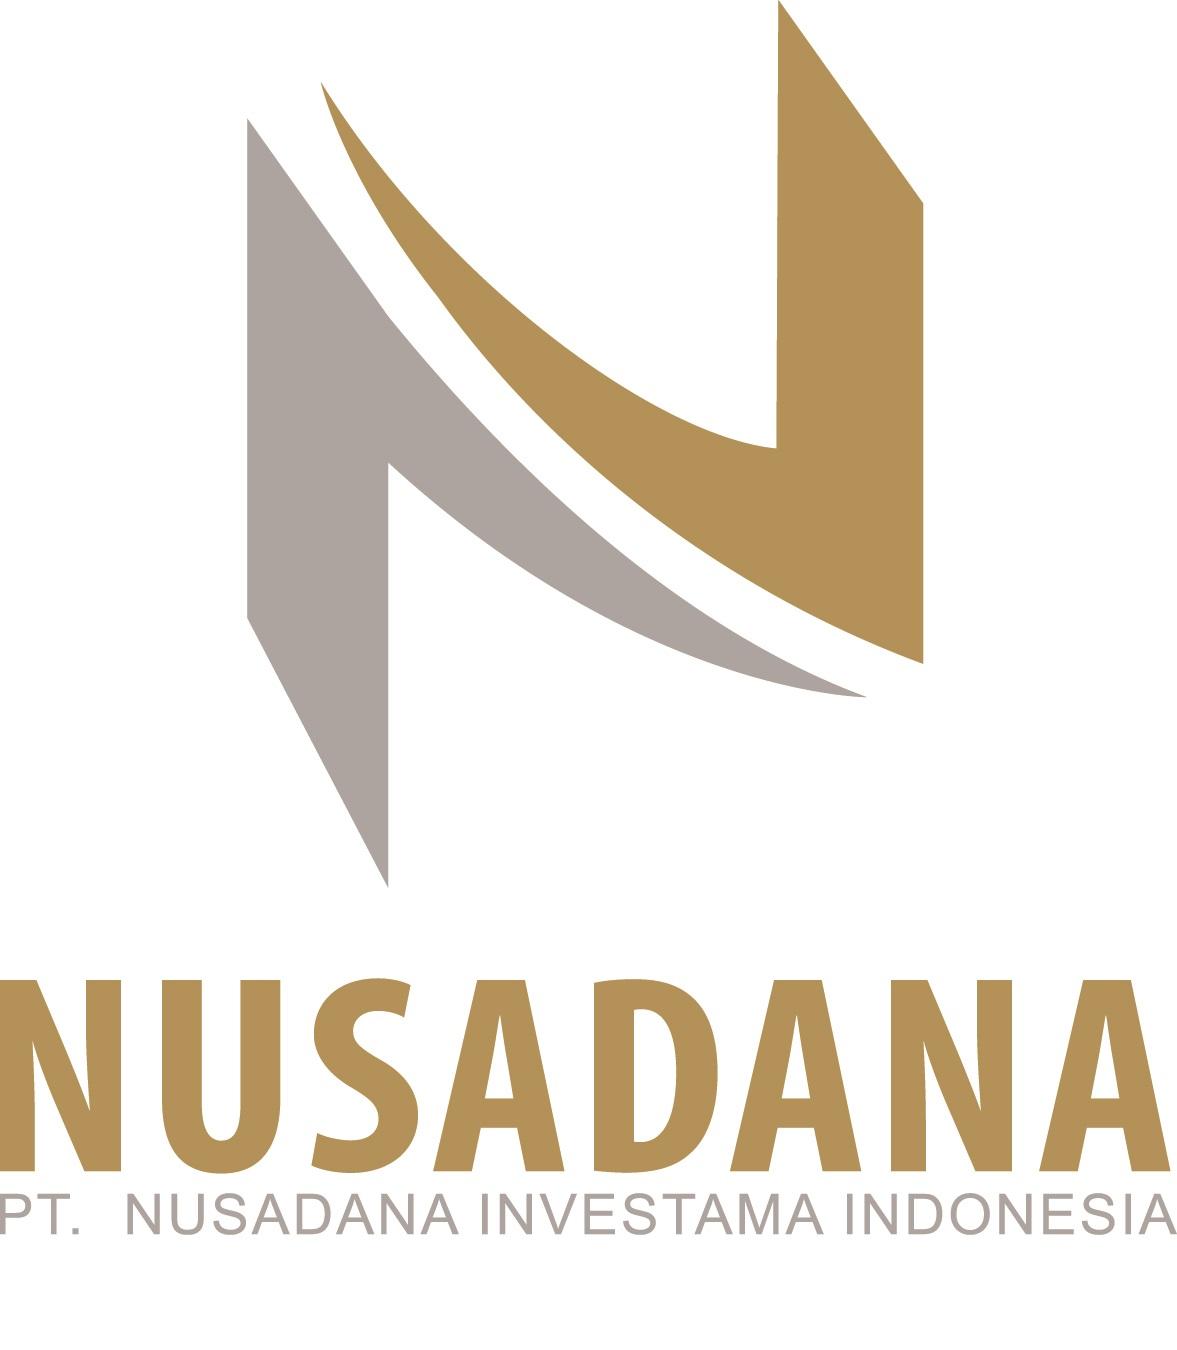 Nusadana Investama Indonesia PT